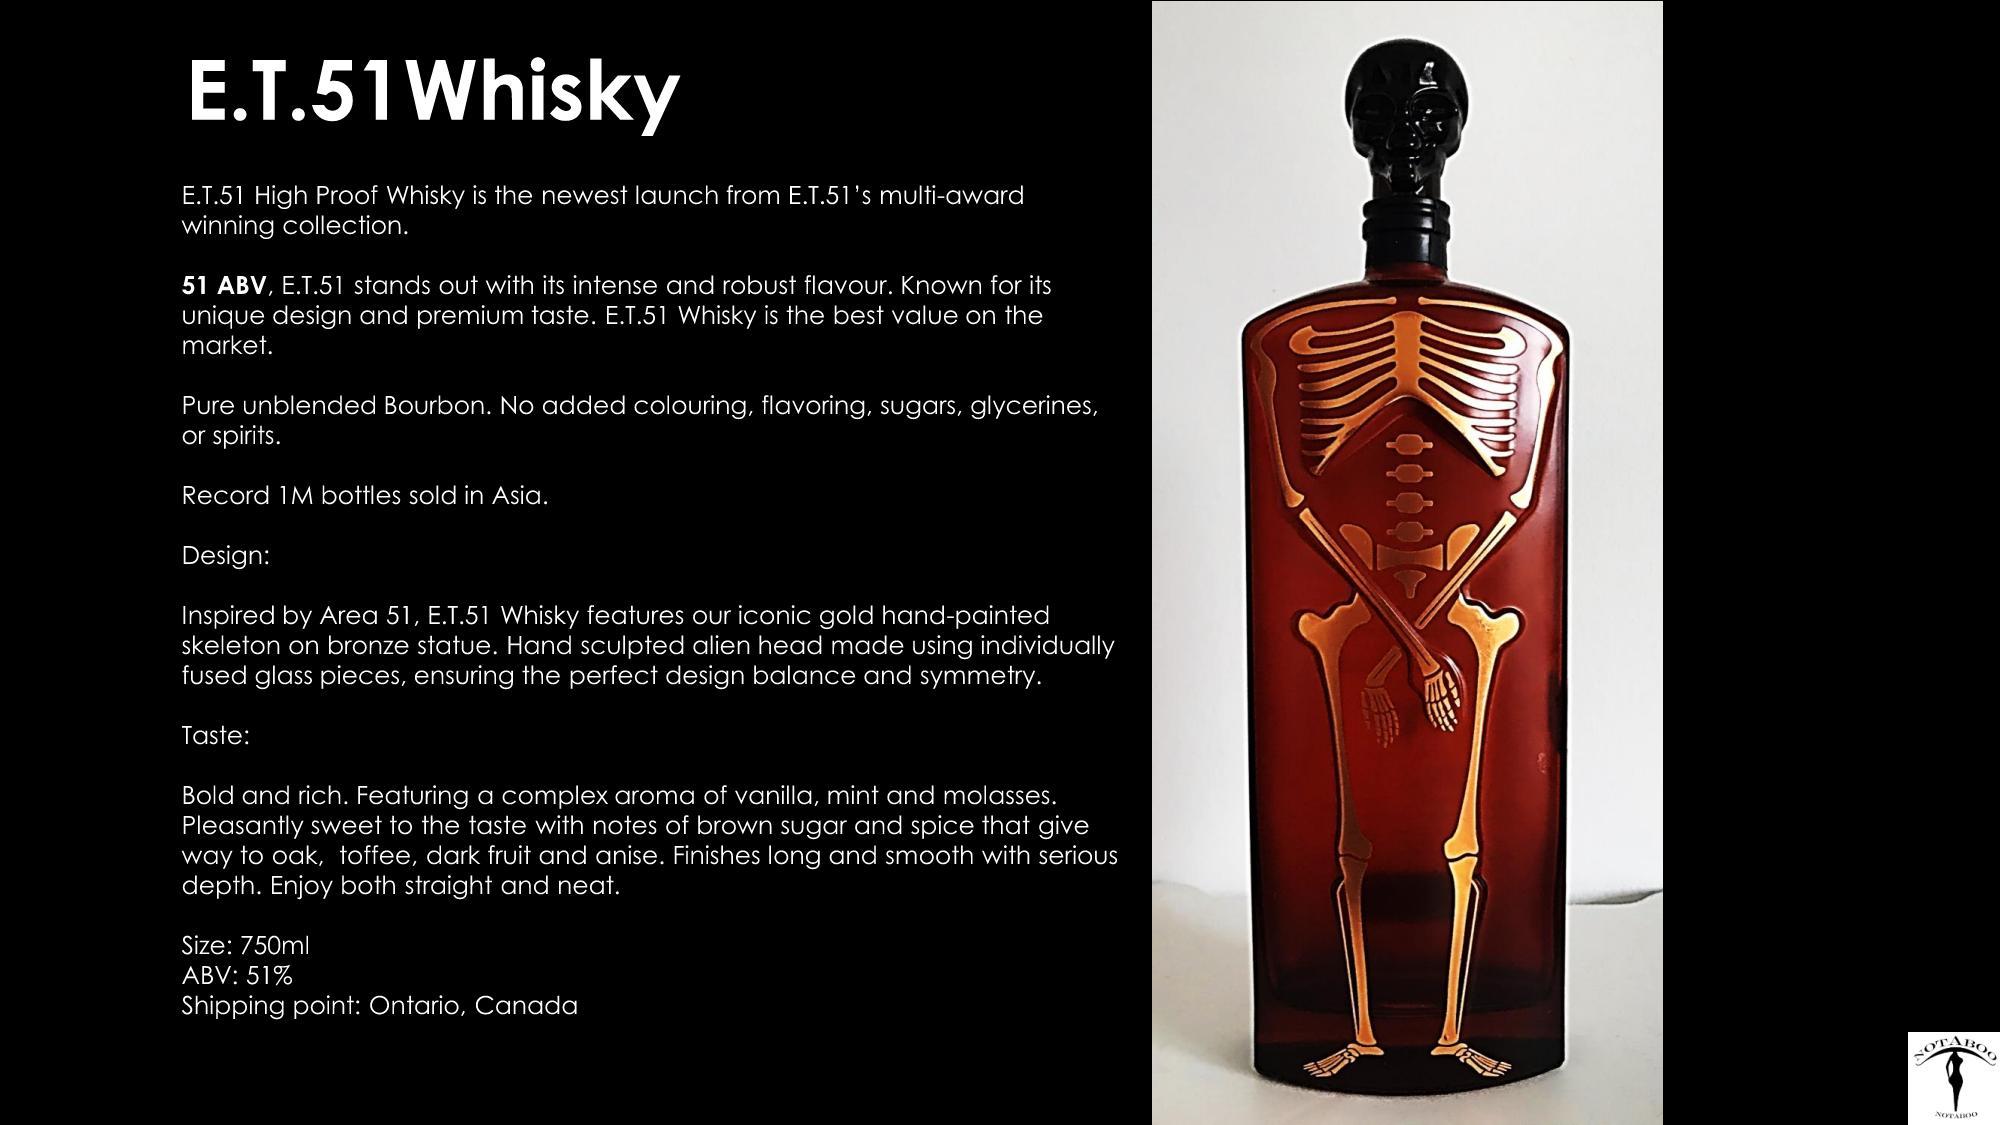 E.T.51-Whisky